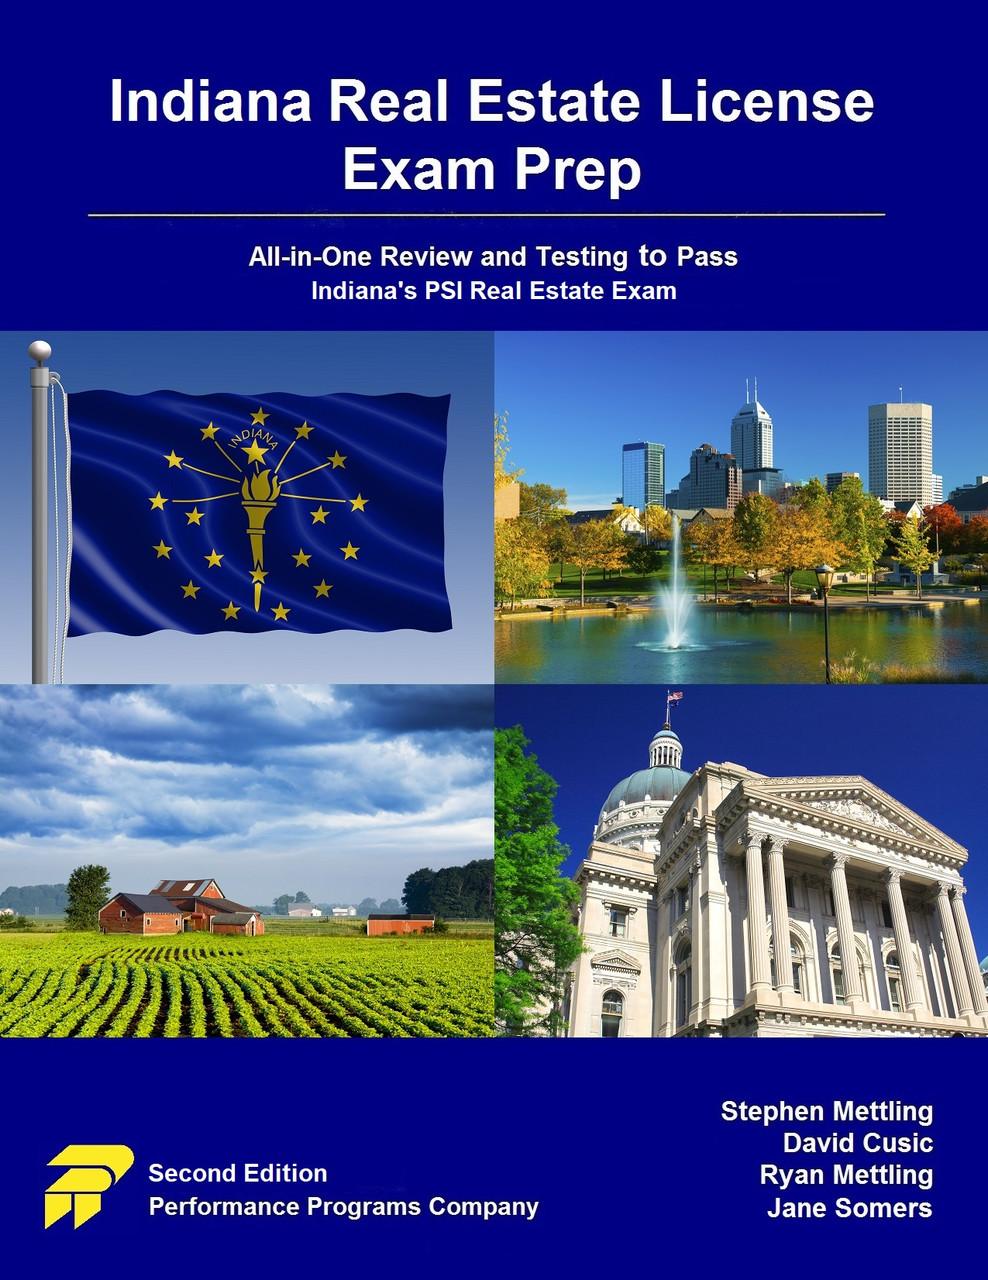 Indiana Real Estate License Exam Prep - PDF version